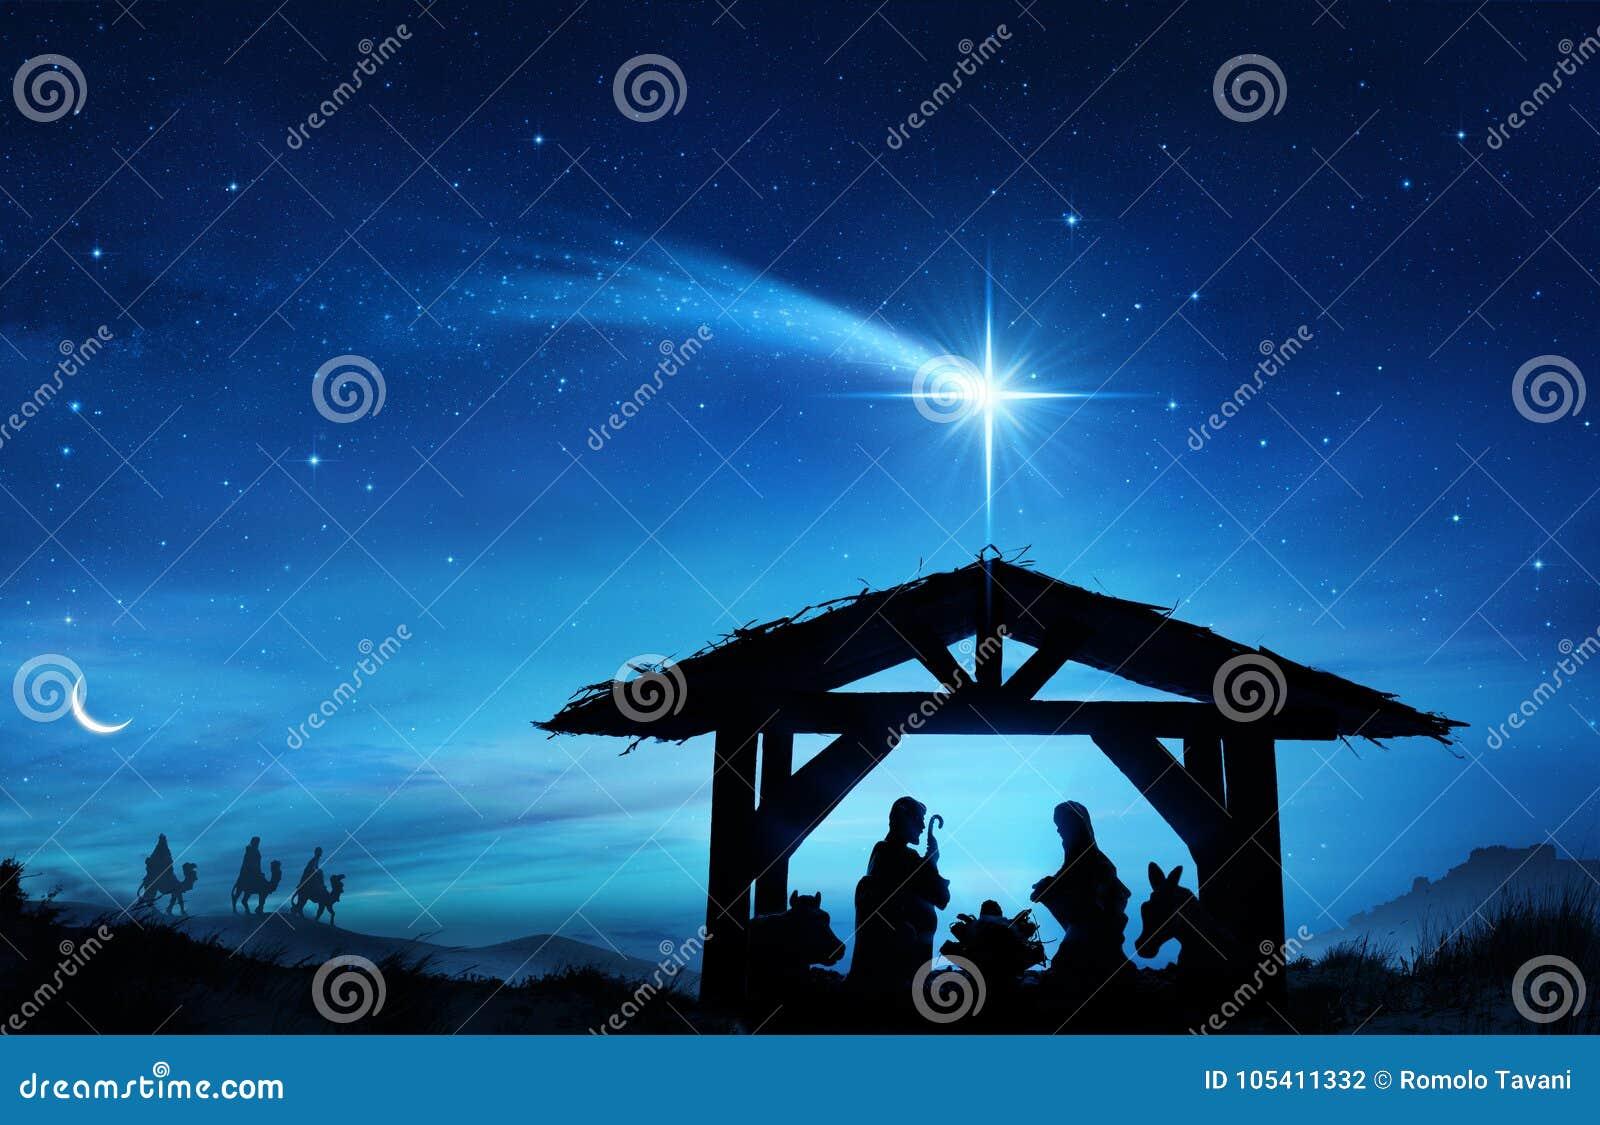 Nativity Scene With The Holy Family